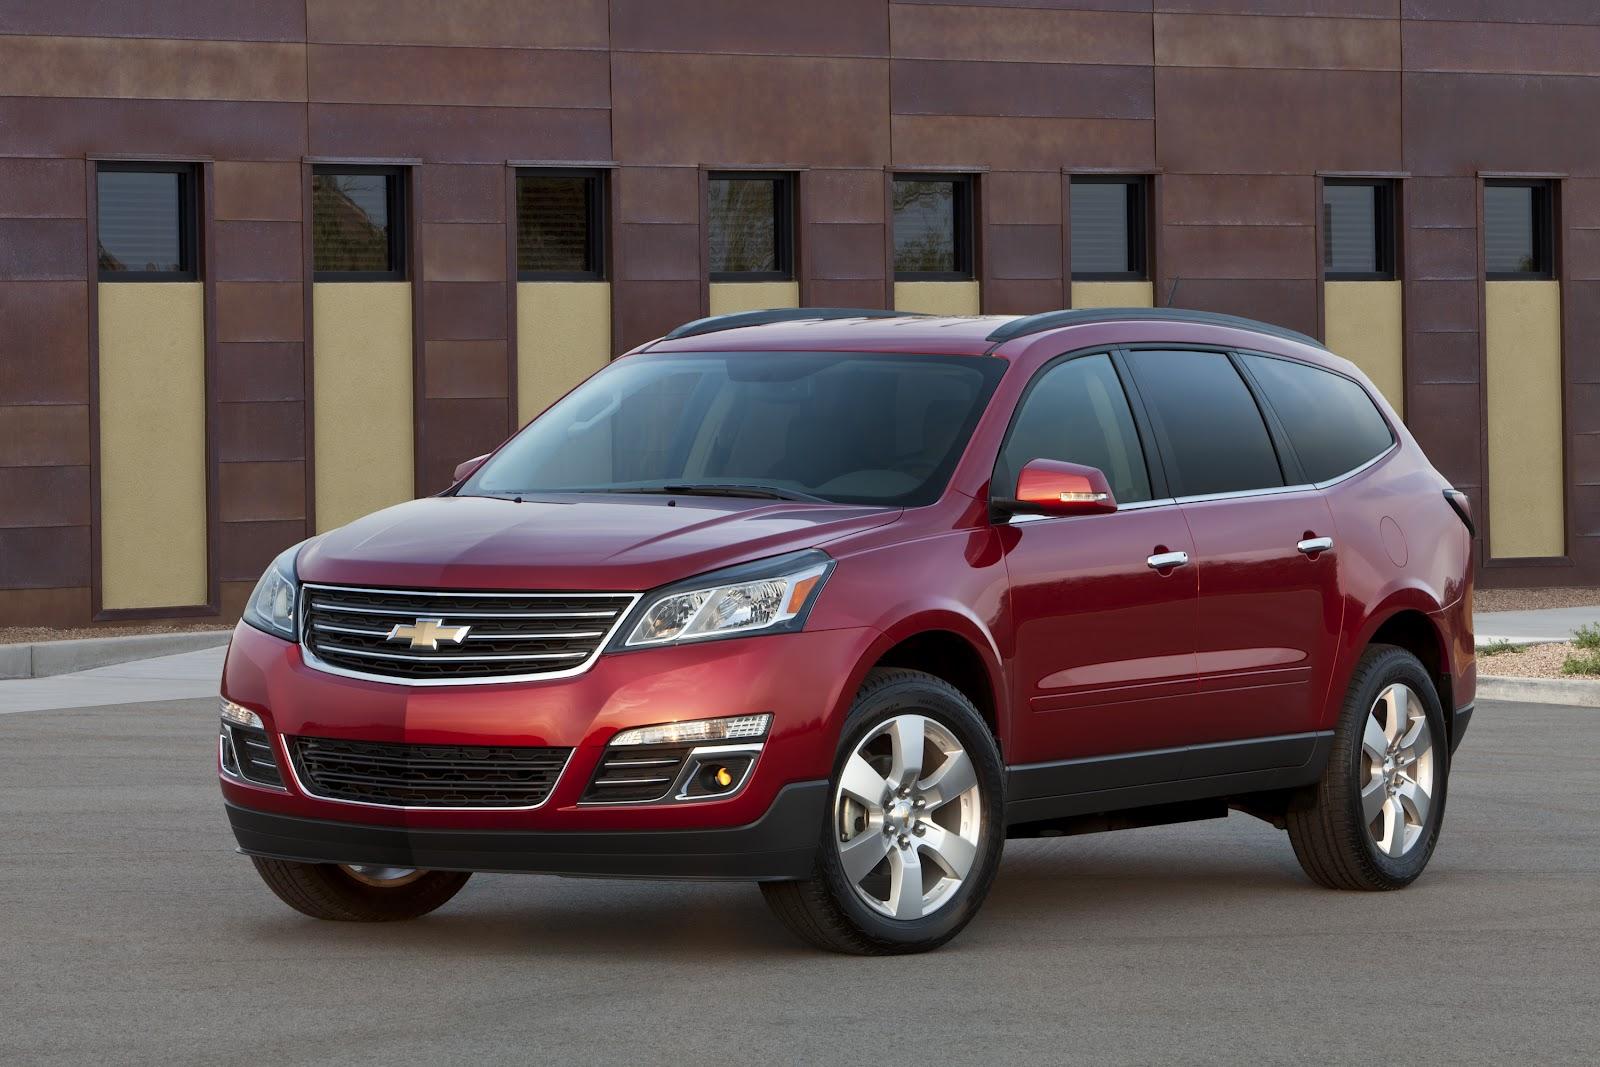 chevrolet - 2009 - [Chevrolet] traverse 2013+chevrolet+traverse+2